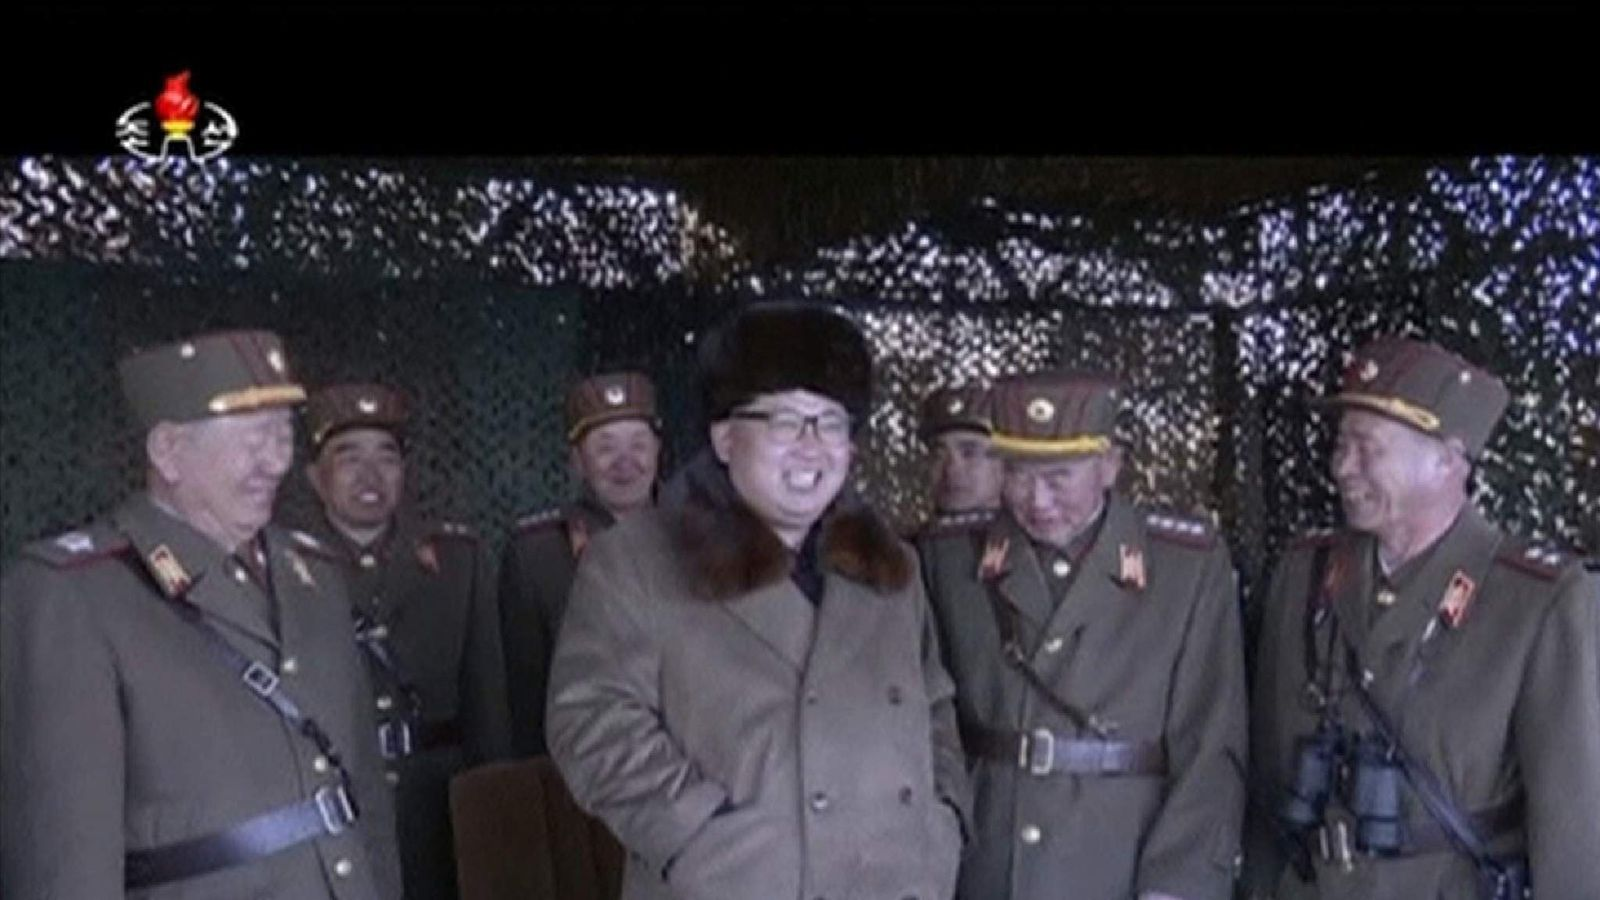 KIM JONG 'UN WEAPONS DRILL